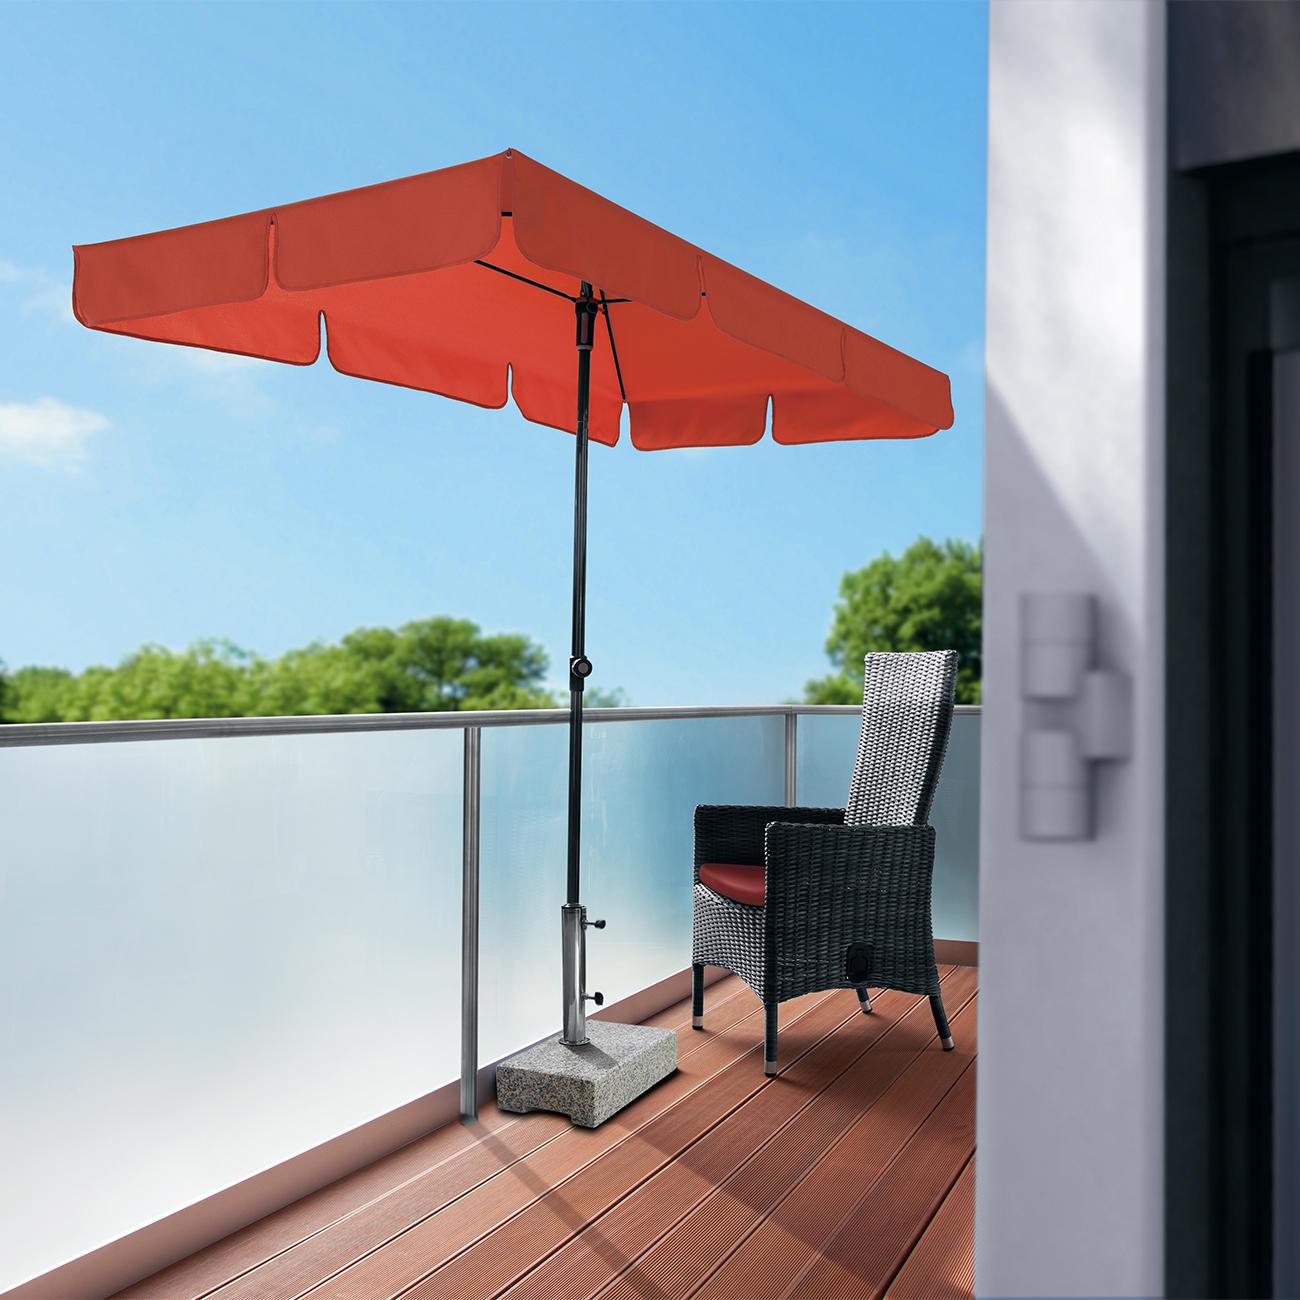 sonnenschirm f r balkon xa56 hitoiro. Black Bedroom Furniture Sets. Home Design Ideas